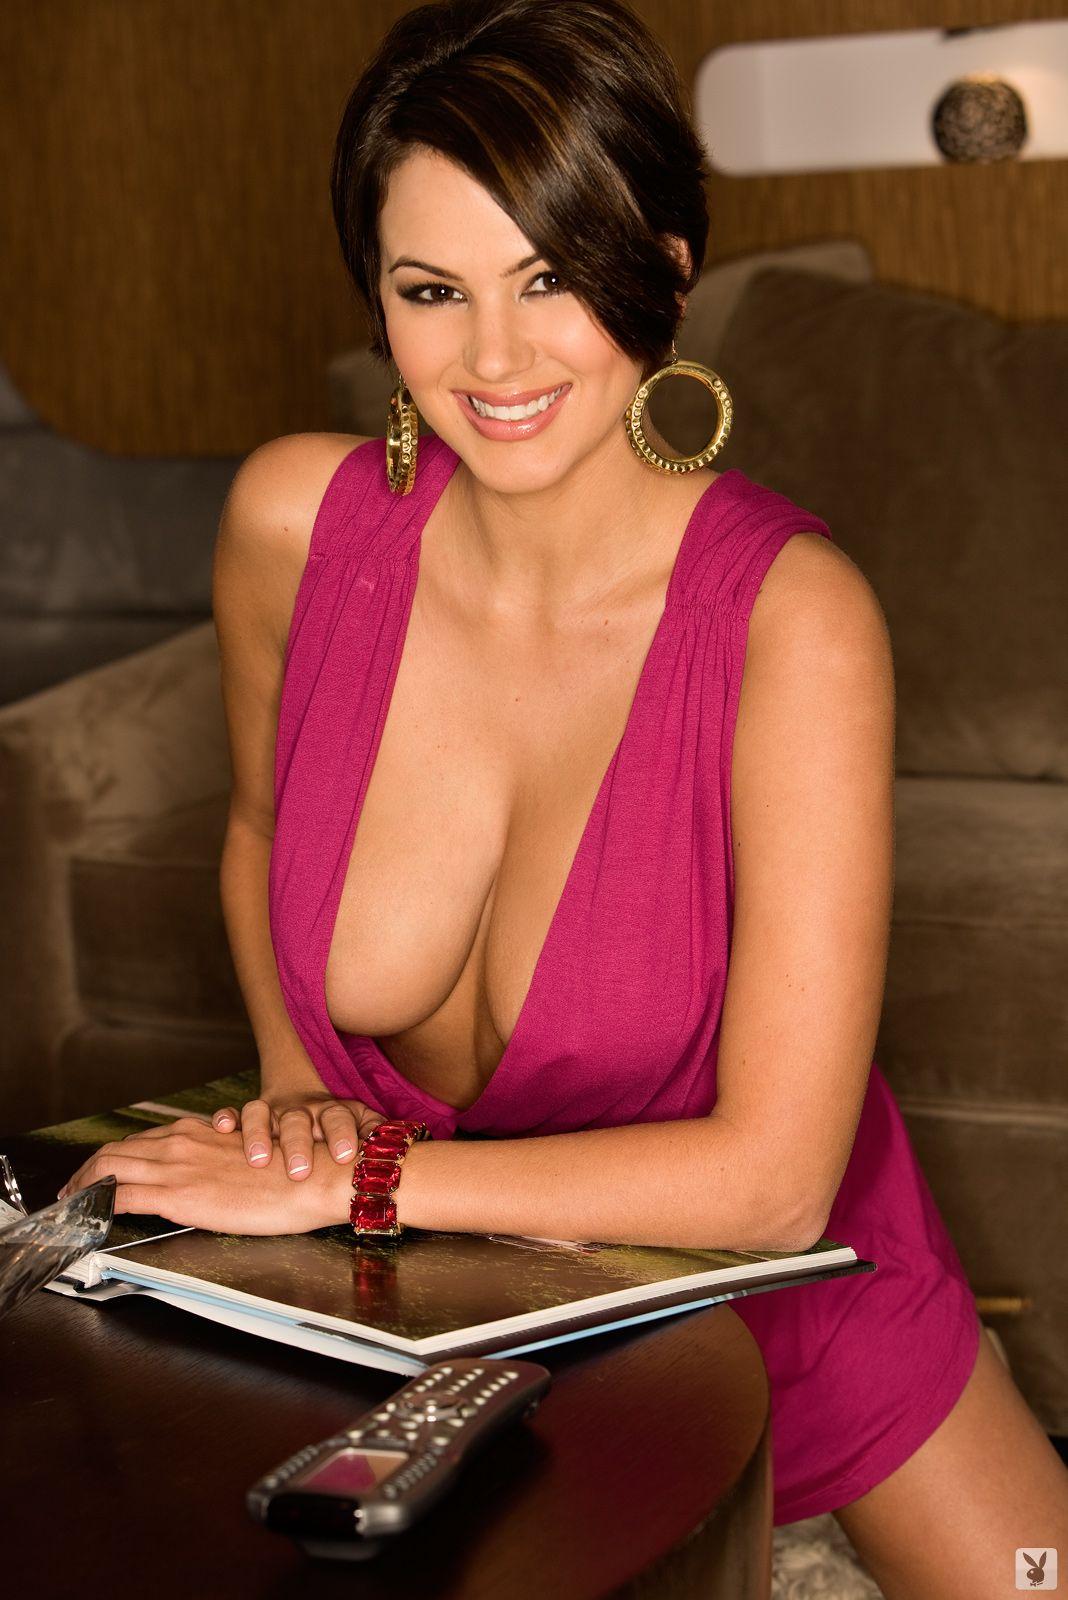 sara stokes sexy images